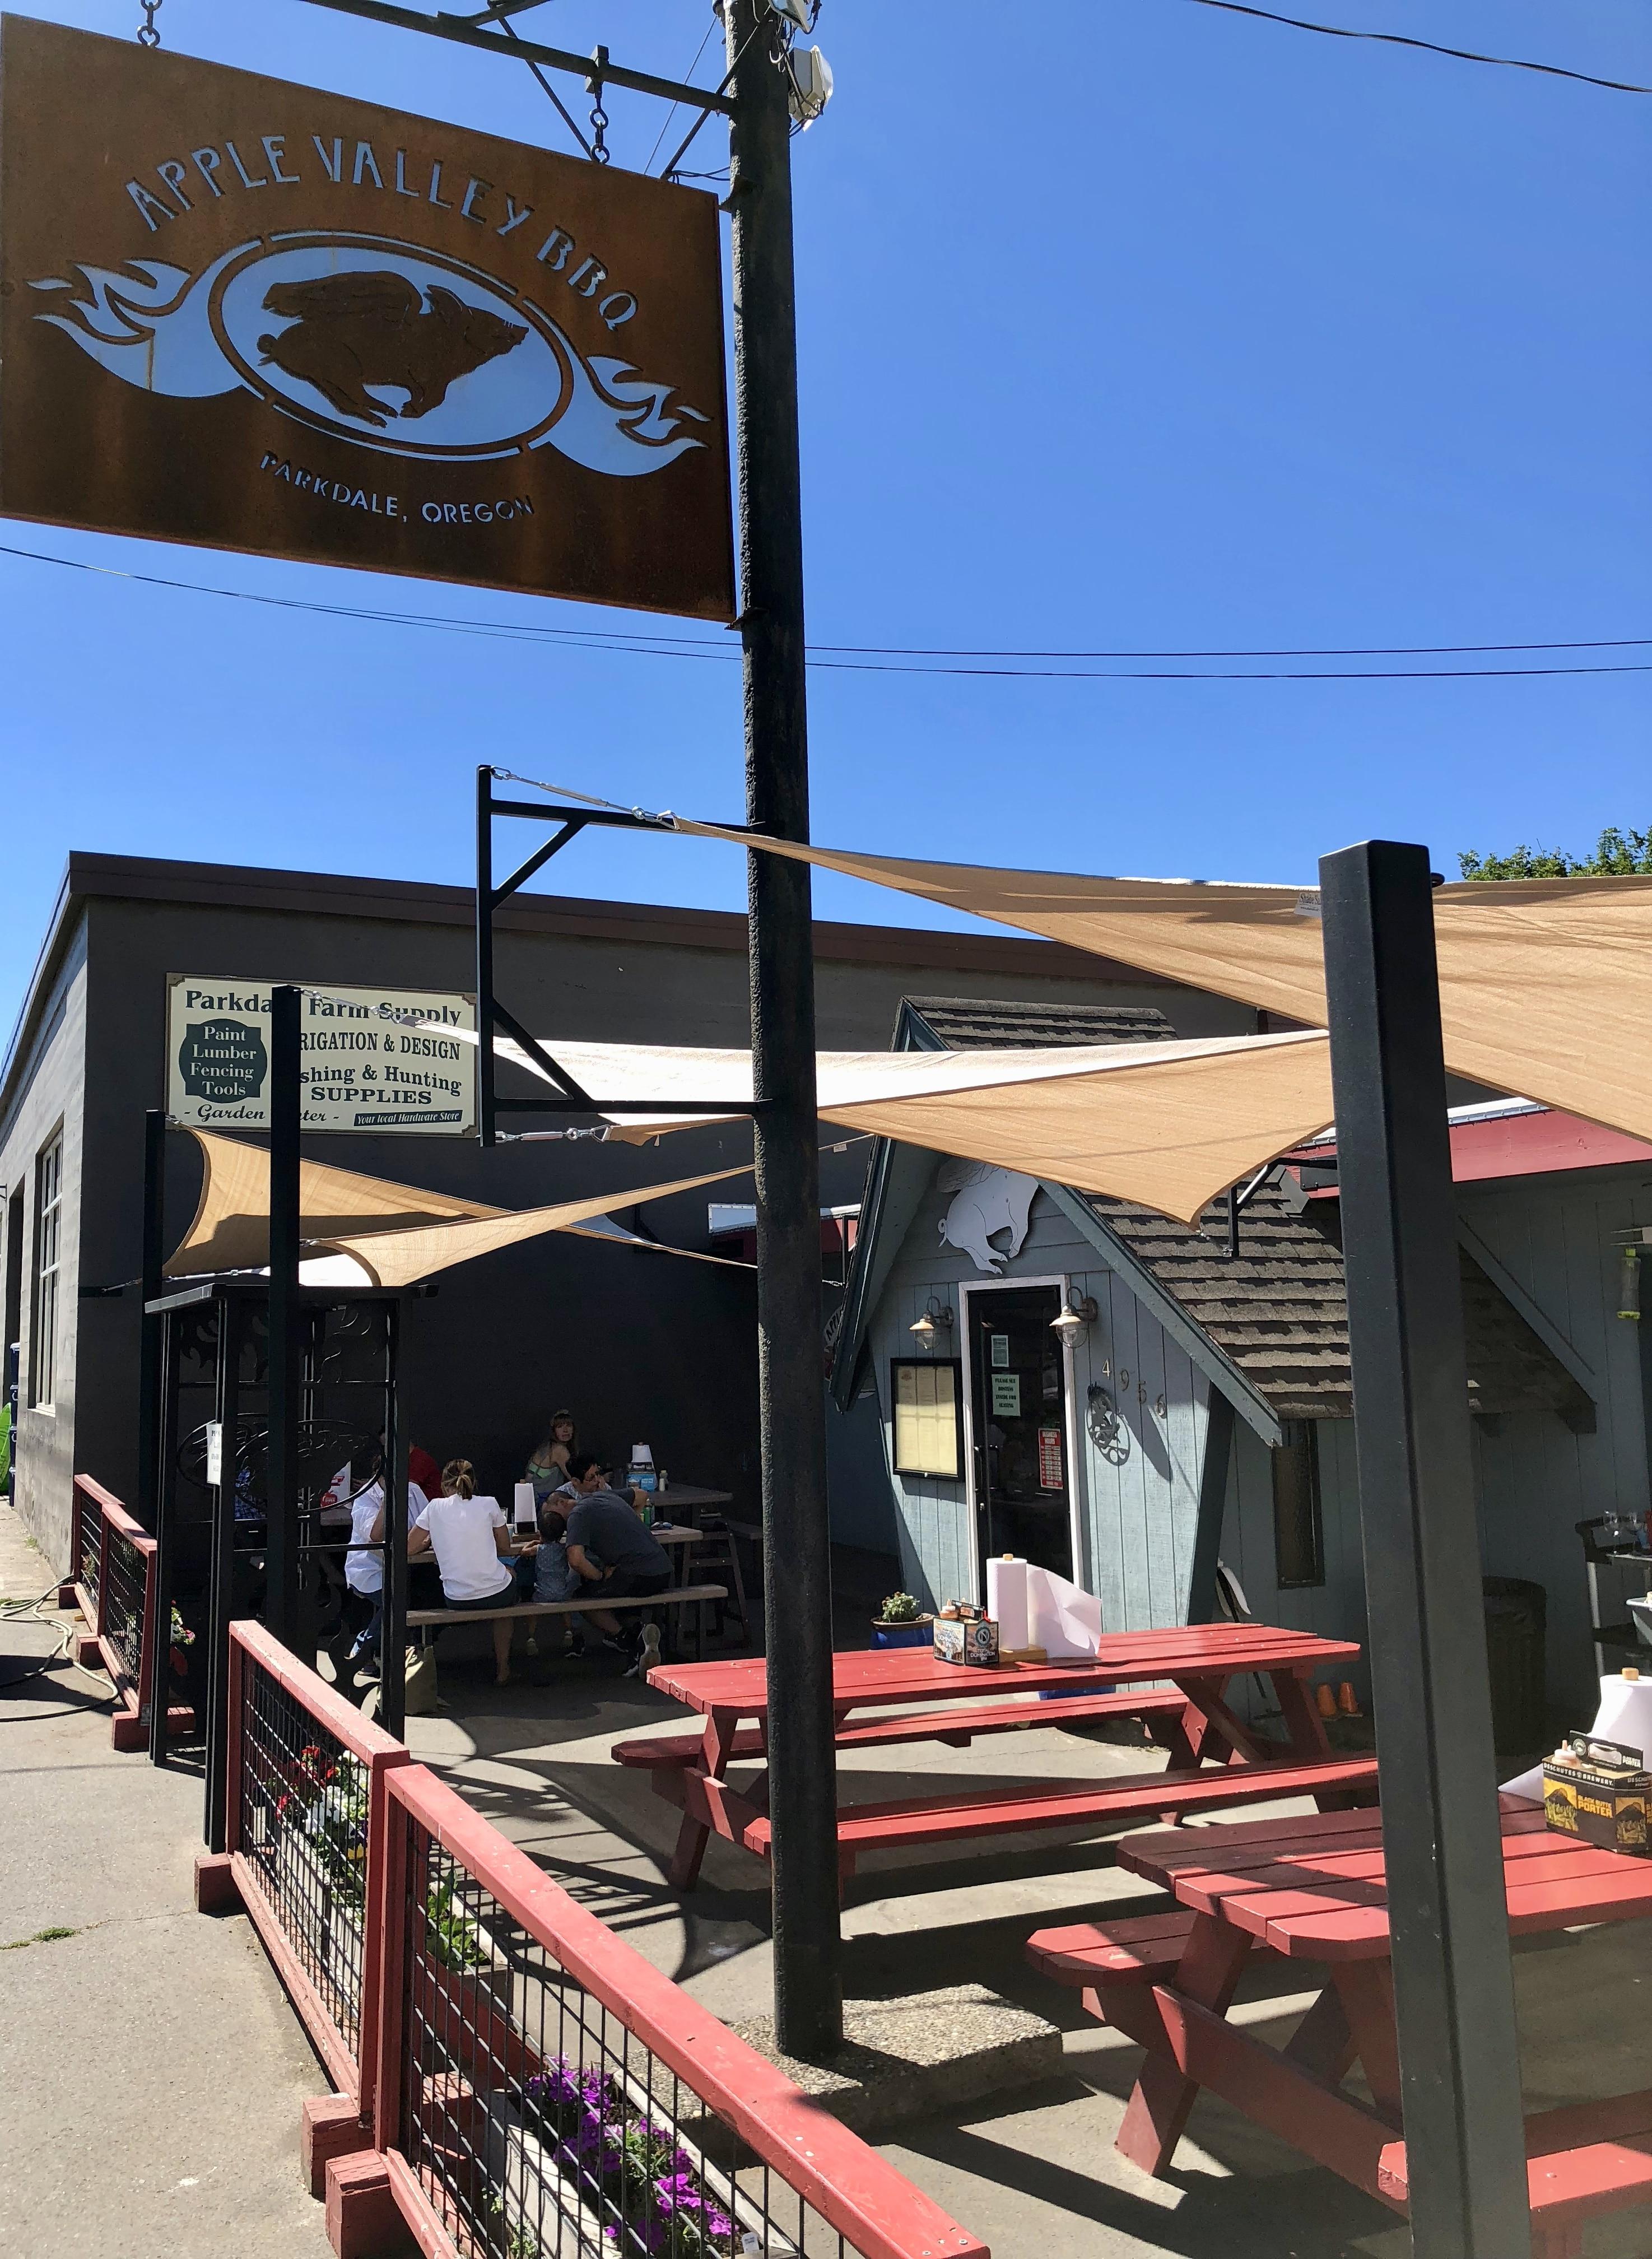 Street View & Alfresco Dining